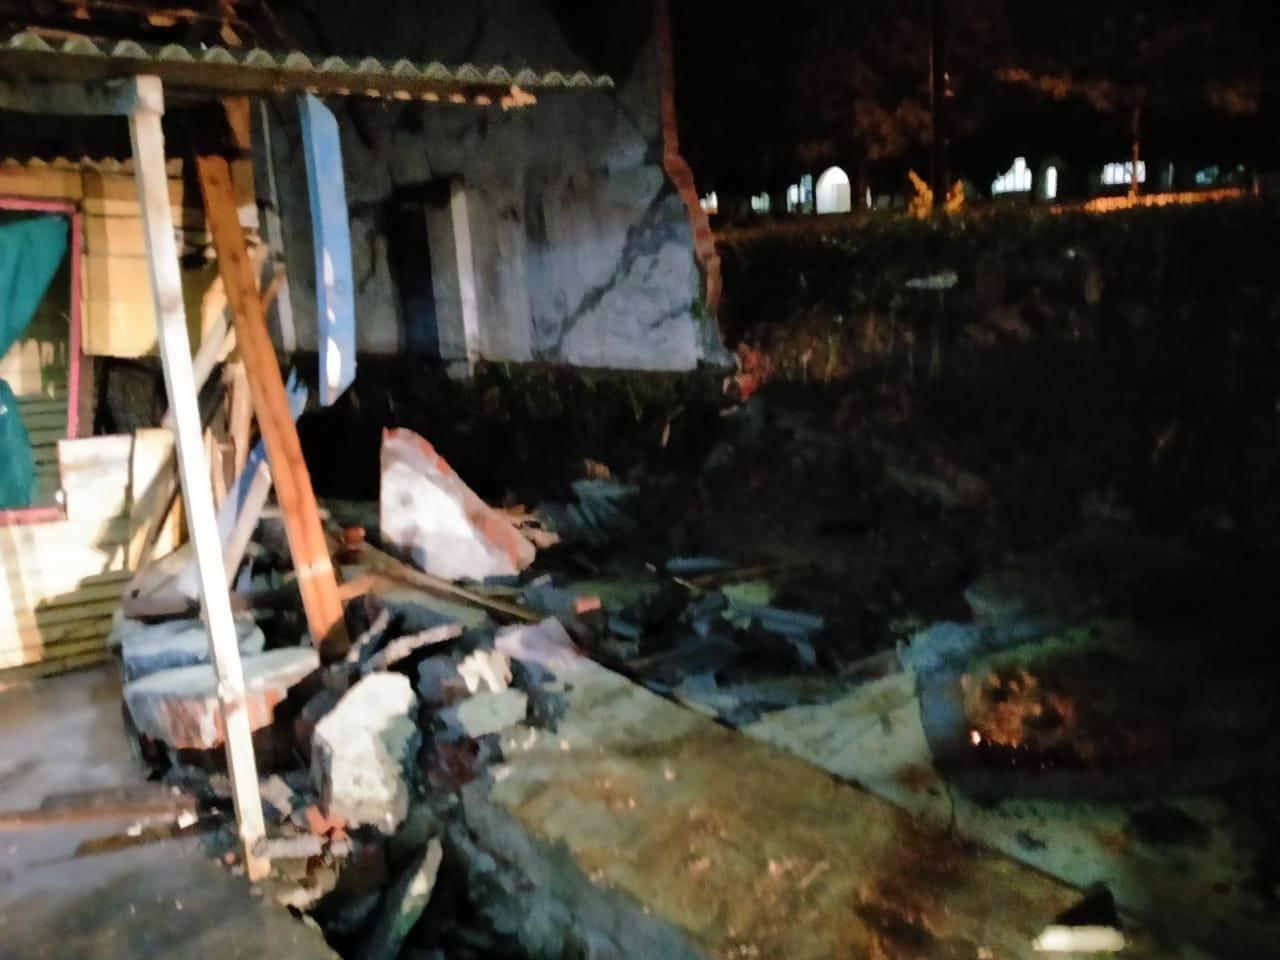 Camat Sarihusin, Ini kondisi rumah Salamah Yang Tertimpa Pagar GSG Islamic Center Kotabumi